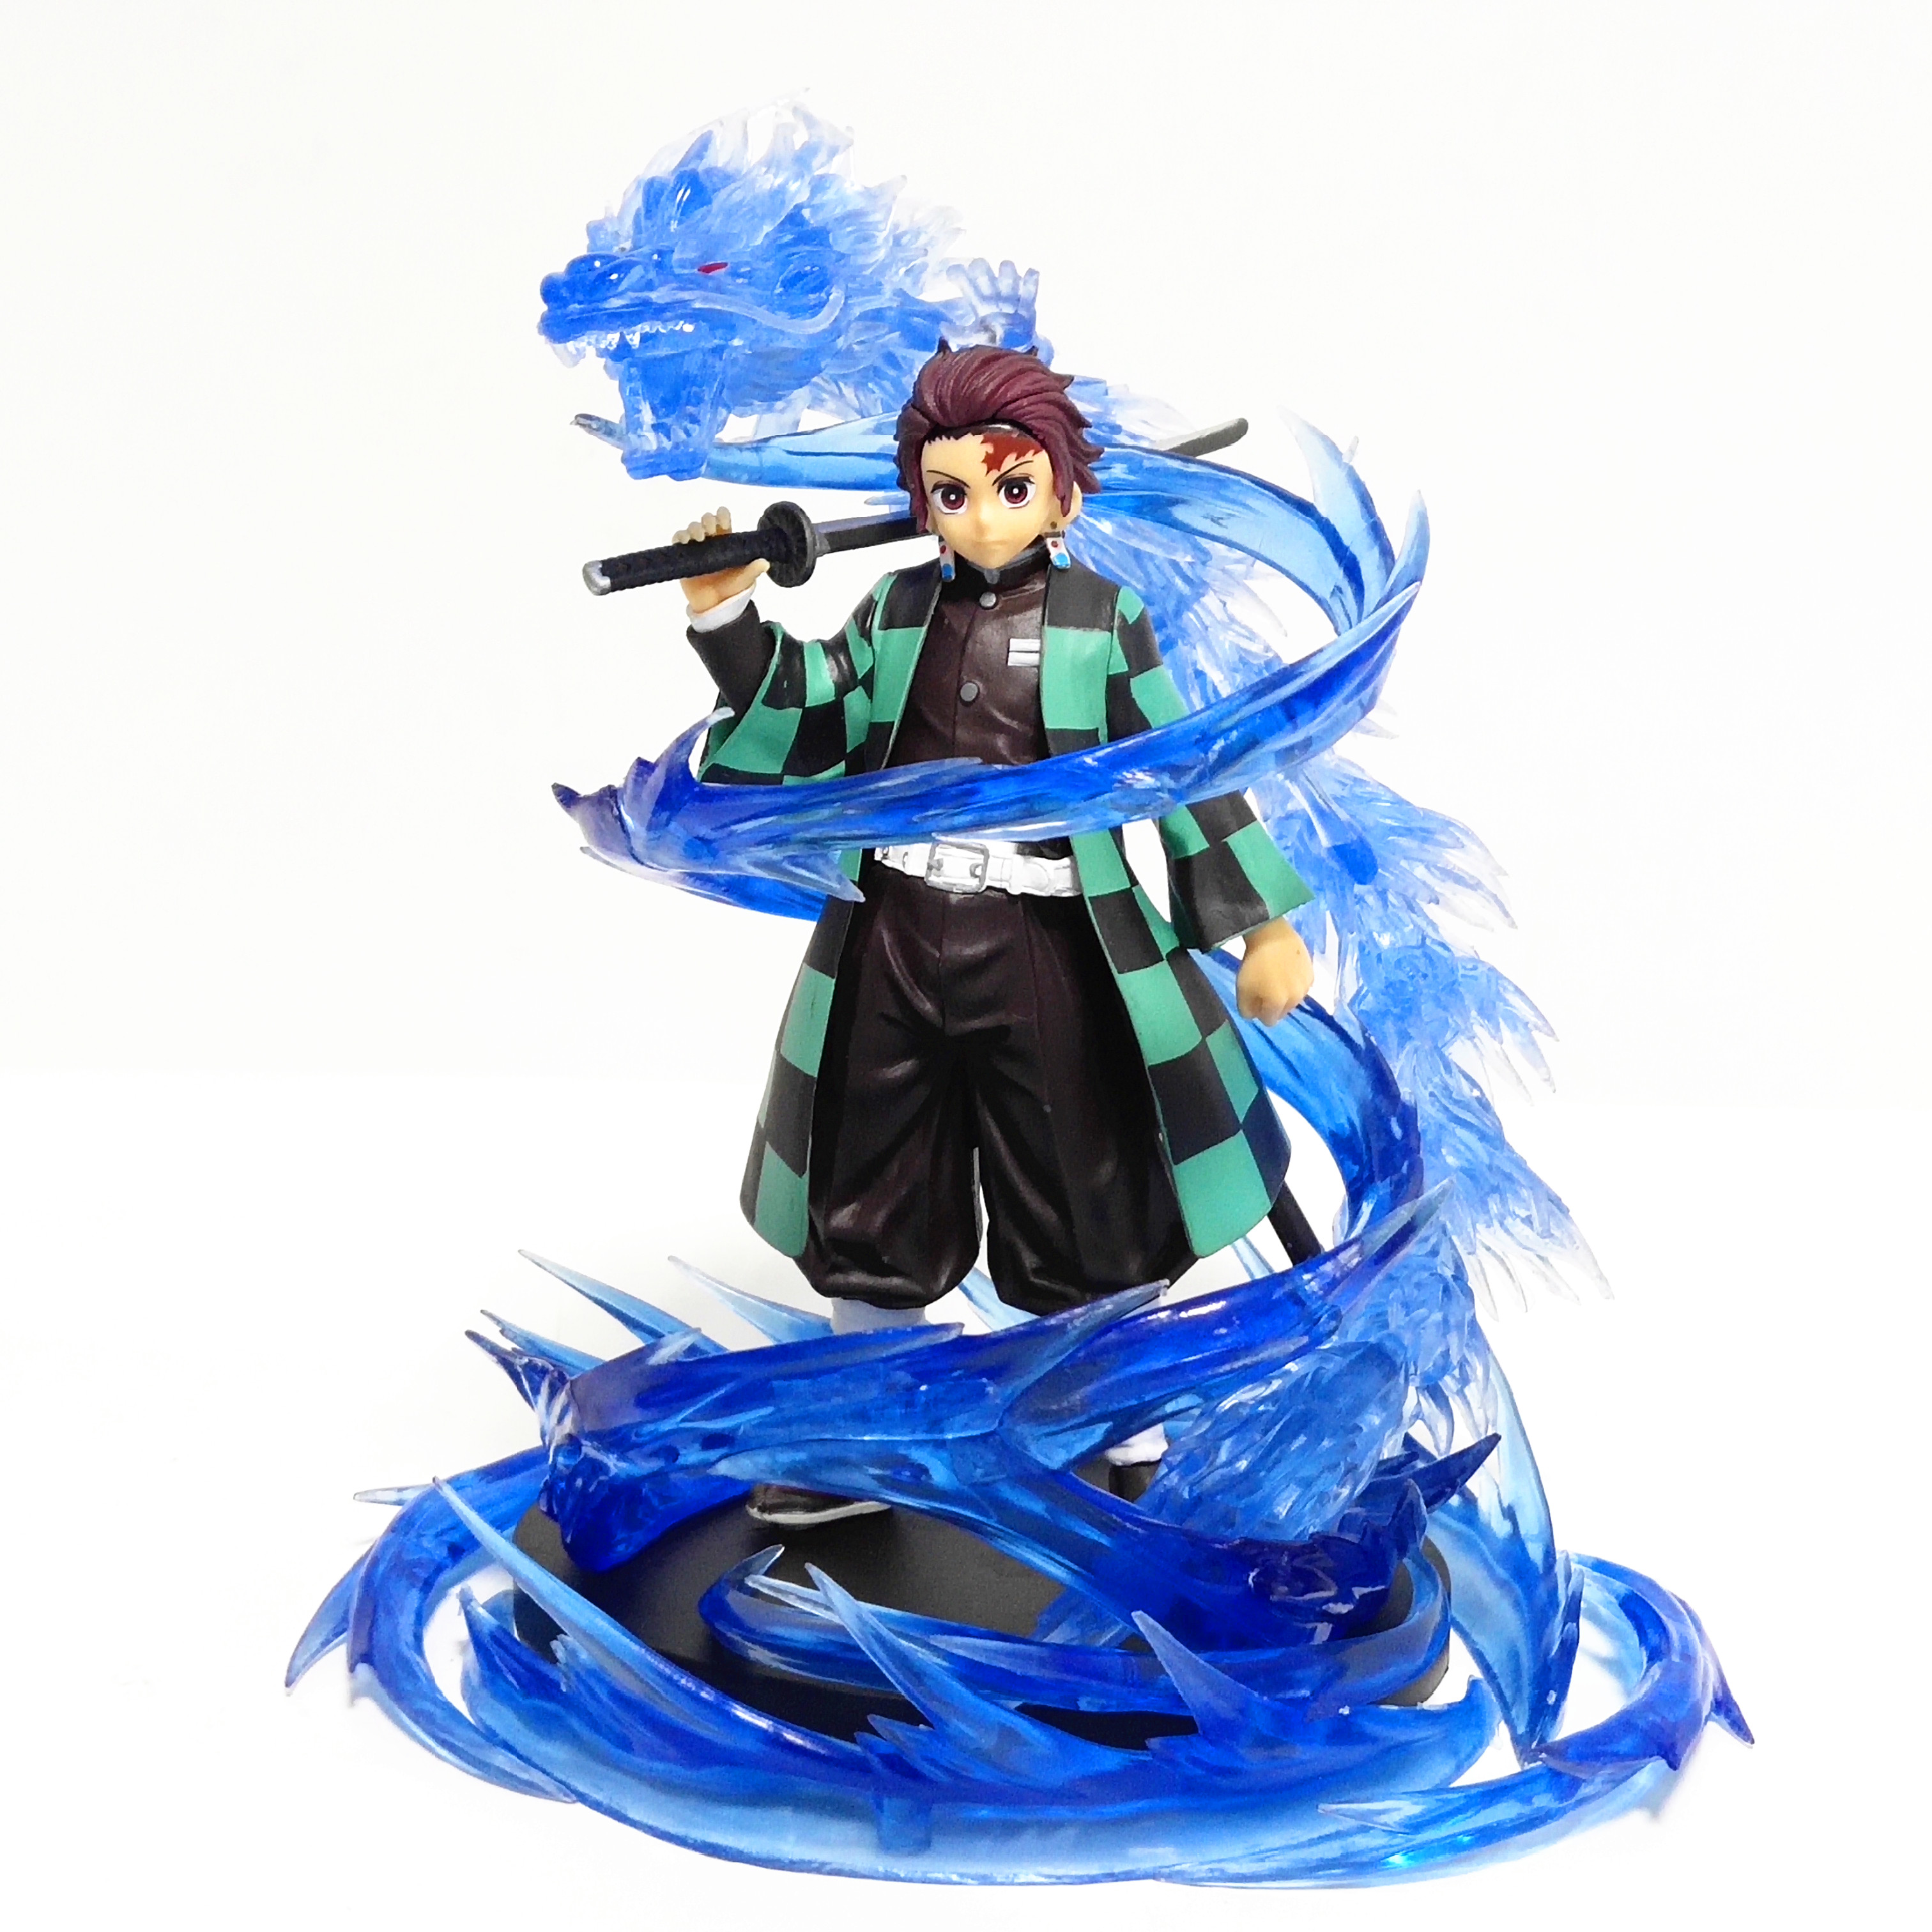 Demon Slayer PVC Action Figures Kamado Tanjirou Tenth Style The Dragon Of Change Anime Kimetsu No Yaiba Figurine DIY Model Toys